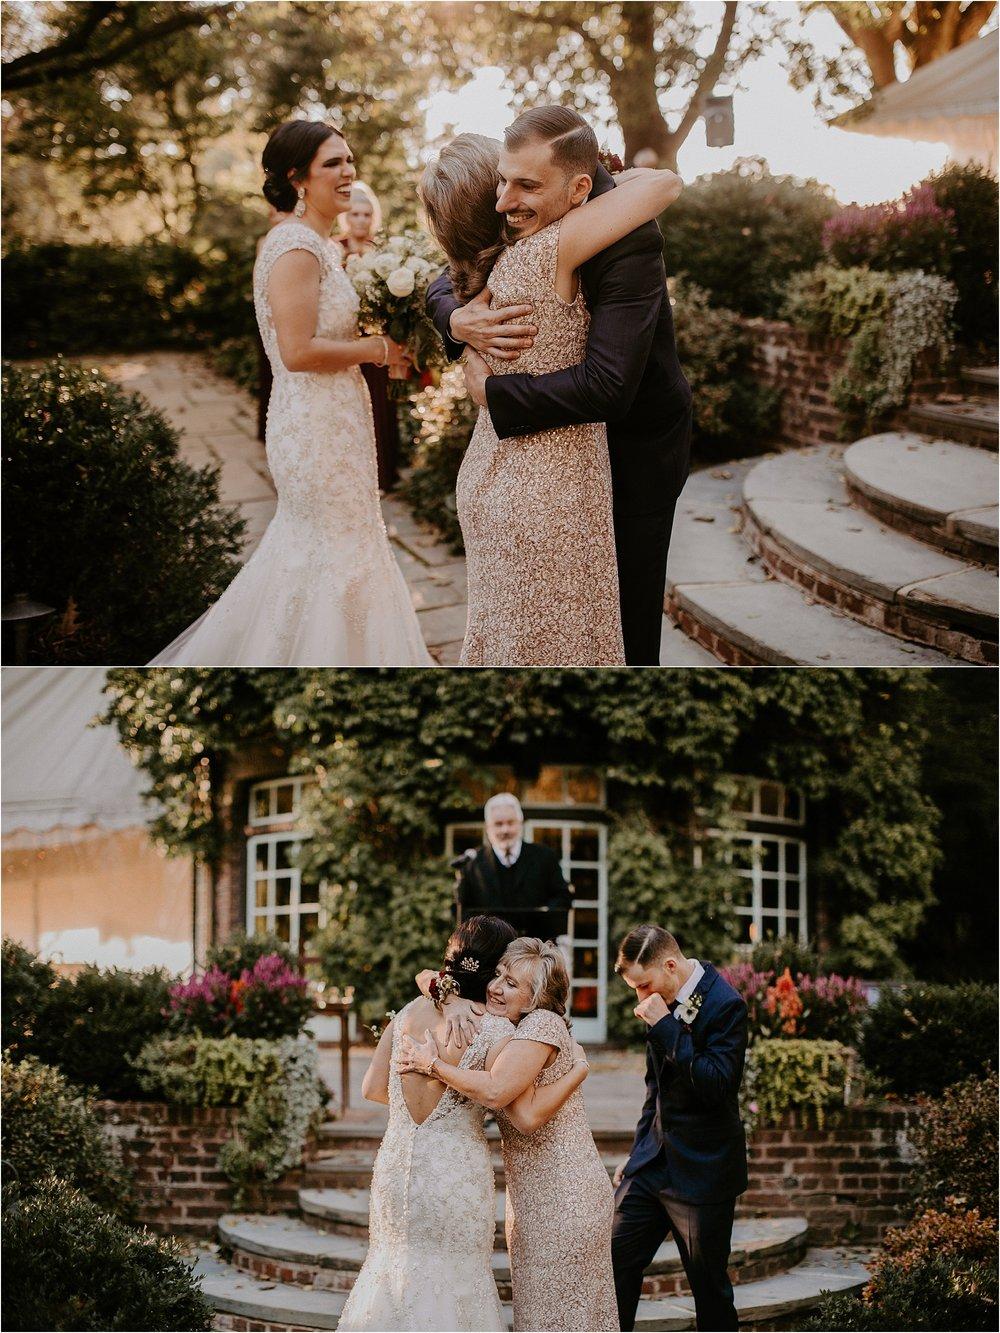 Sarah_Brookhart_Philadelphia_Wedding_Photographer_0035.jpg